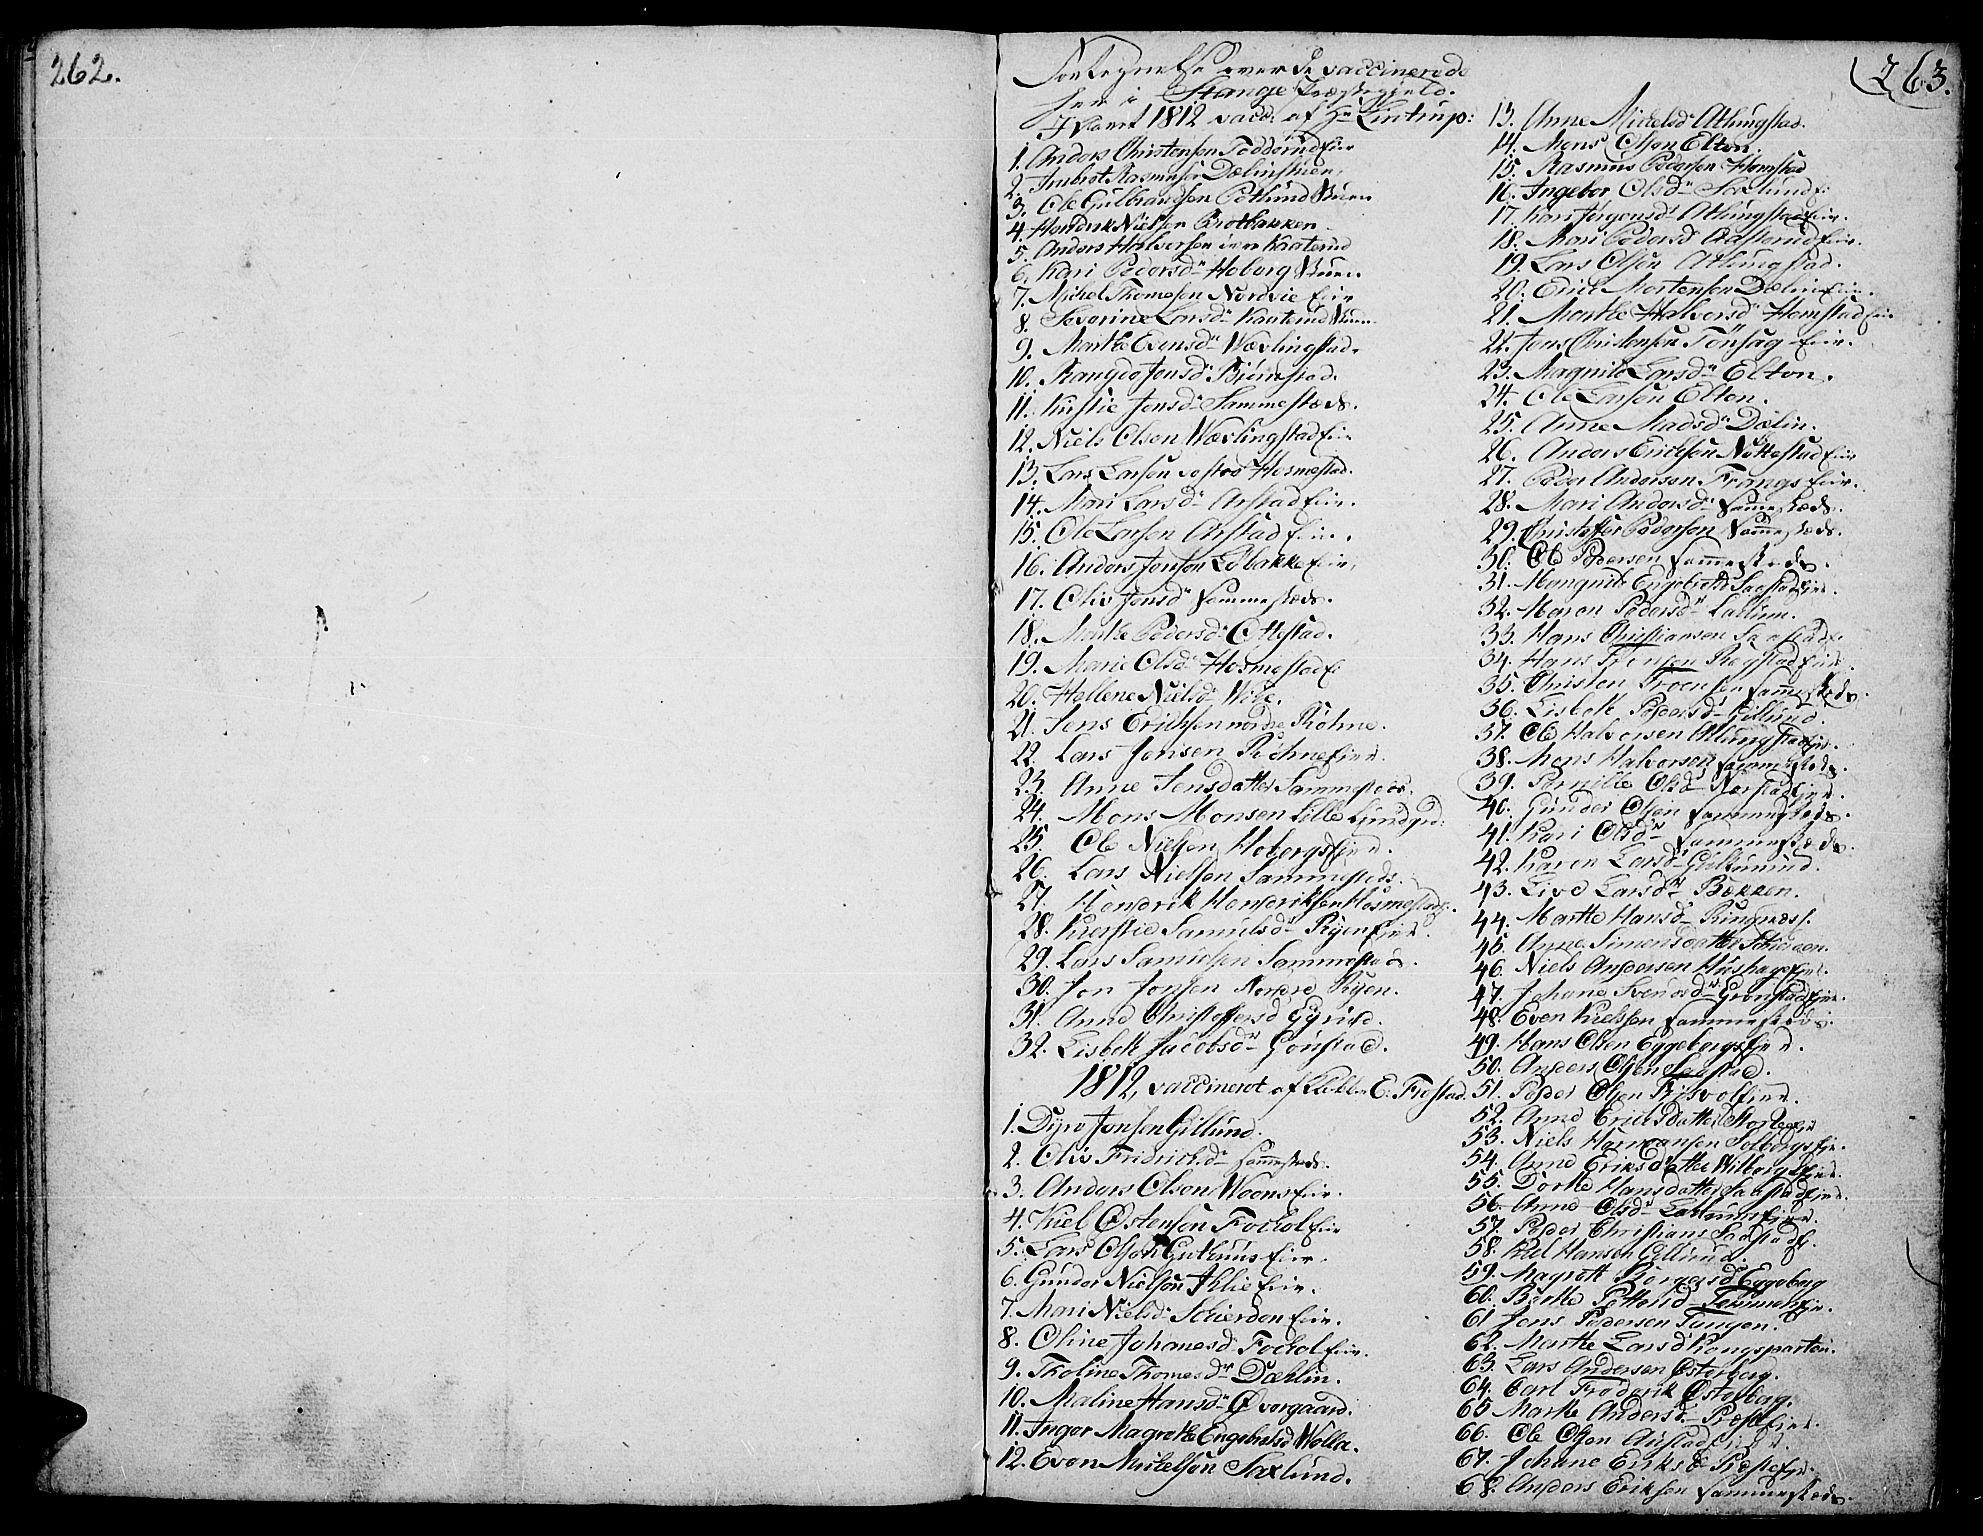 SAH, Stange prestekontor, K/L0007: Ministerialbok nr. 7, 1788-1813, s. 262-263